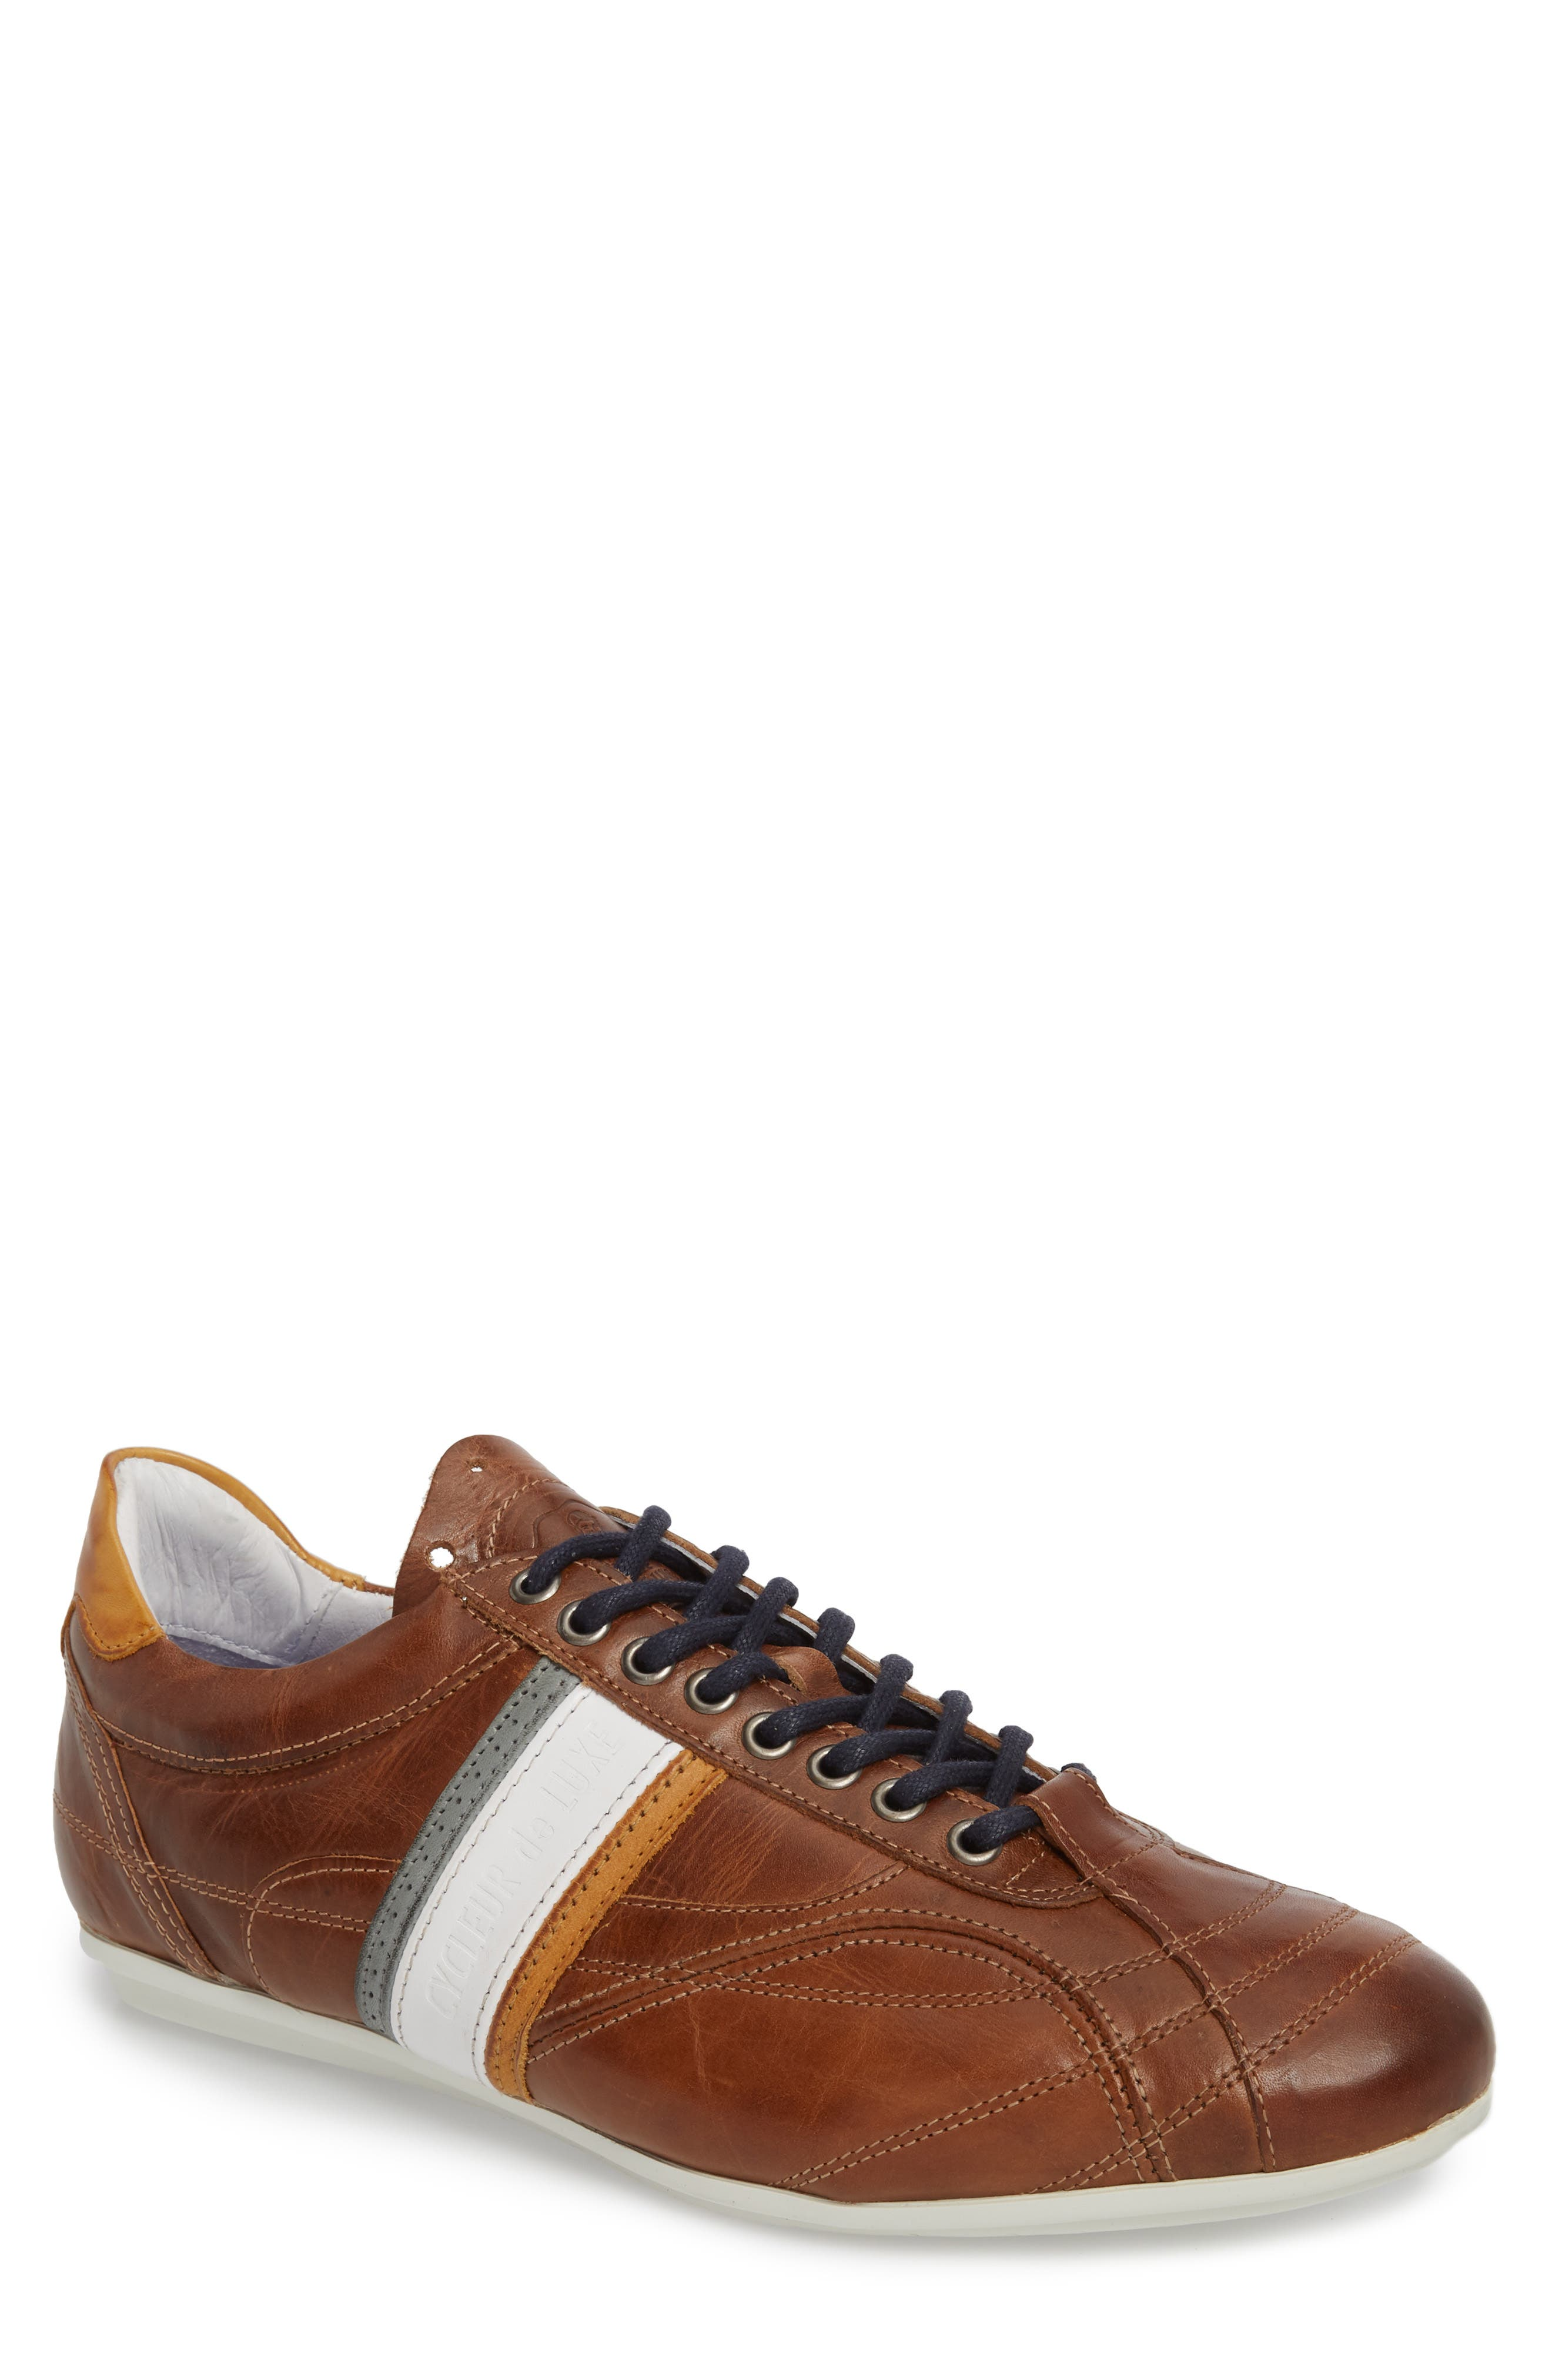 Crush City Low Top Sneaker,                         Main,                         color, COGNAC LEATHER